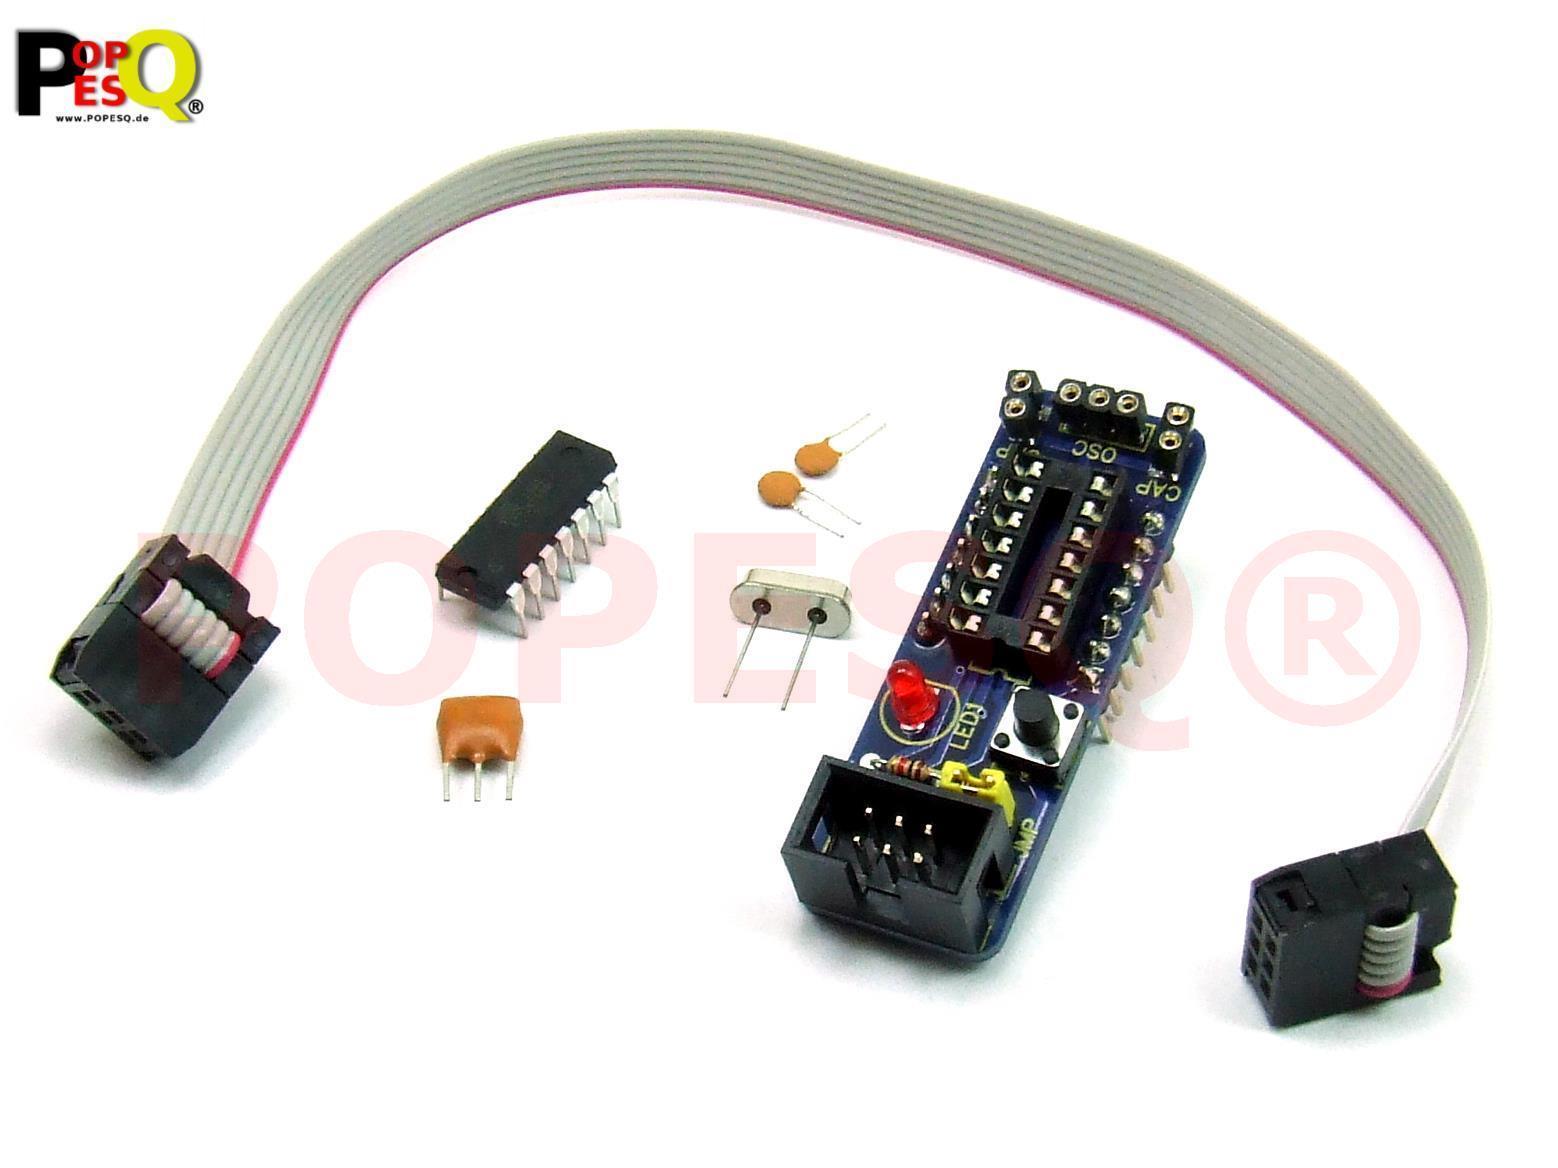 Steckboard 400 lötfreies Breadboard Prototyping Board für Arduino Raspberry etc